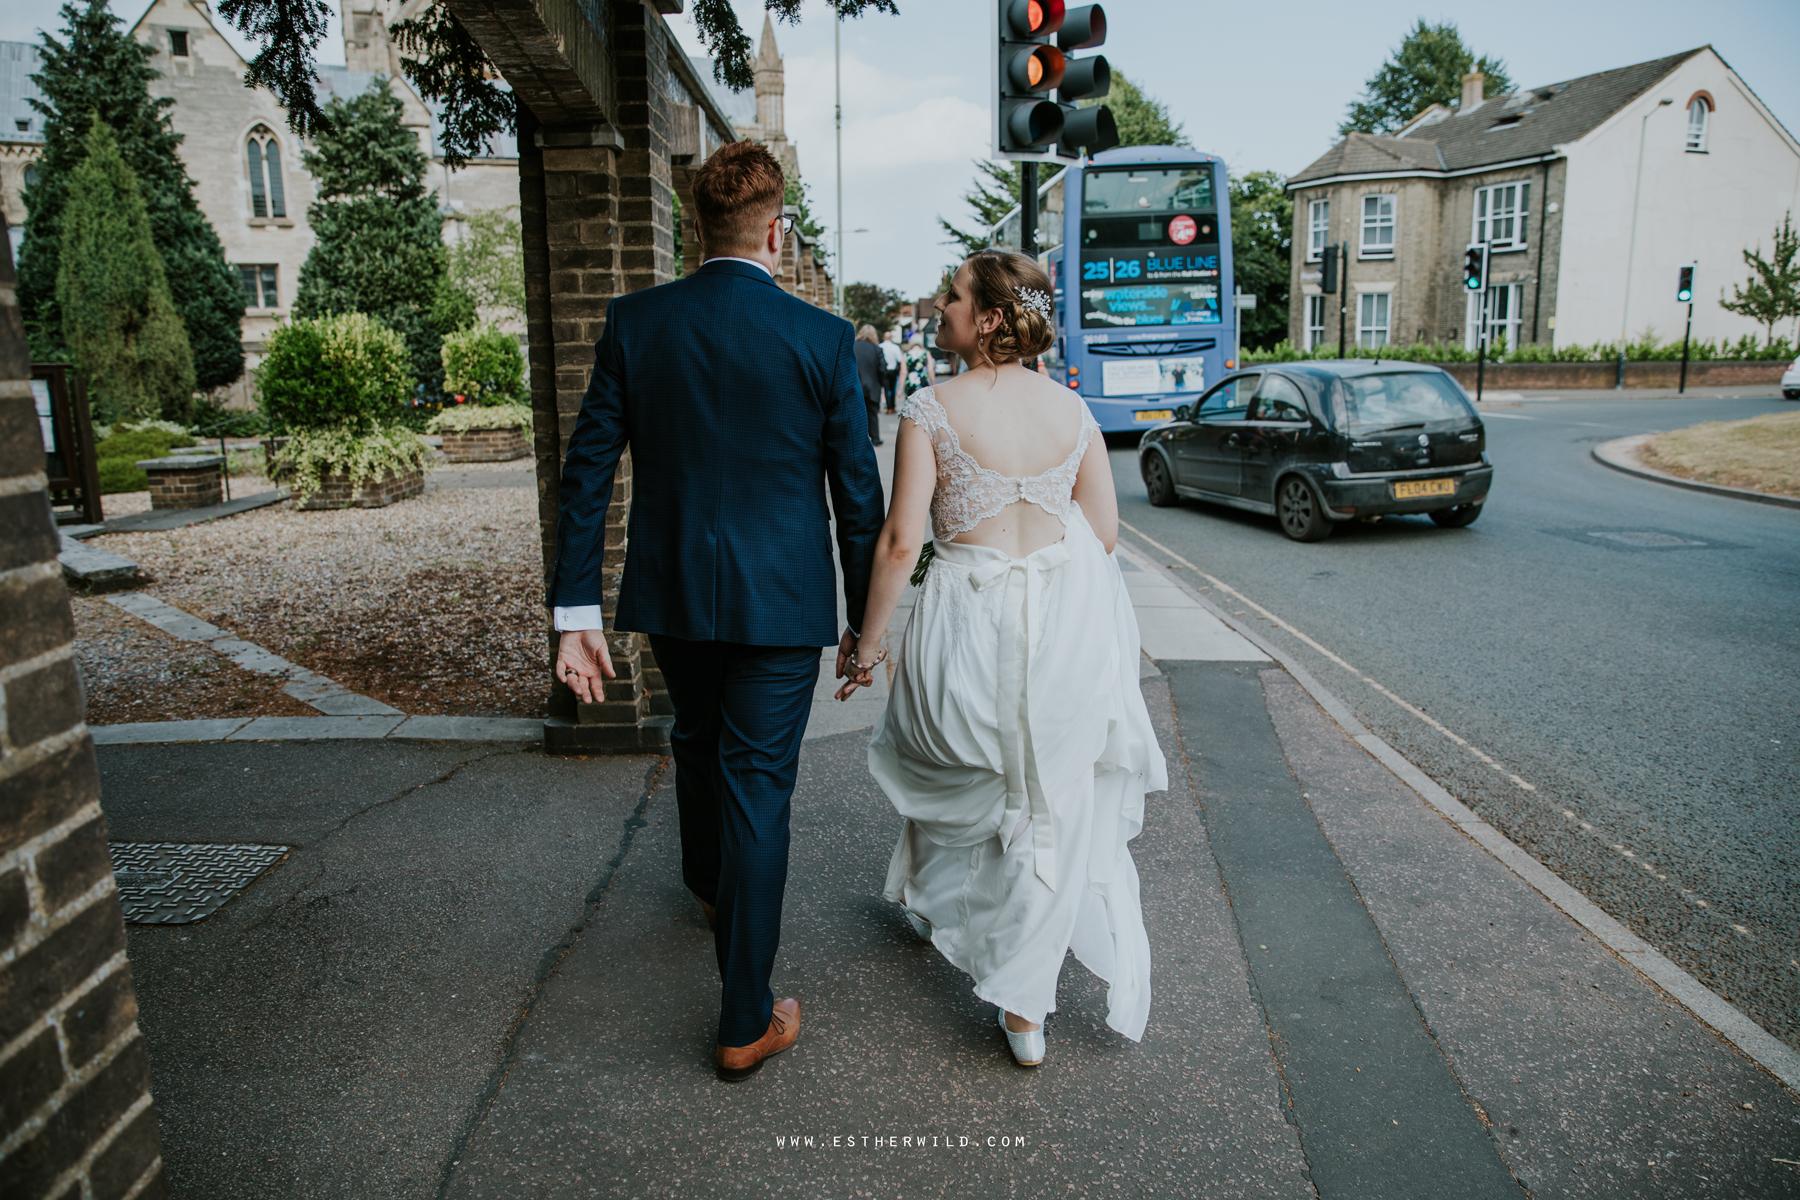 The_Georgian_Townhouse_Wedding_Norwich_Esther_Wild_Photographer_3R8A1512.jpg